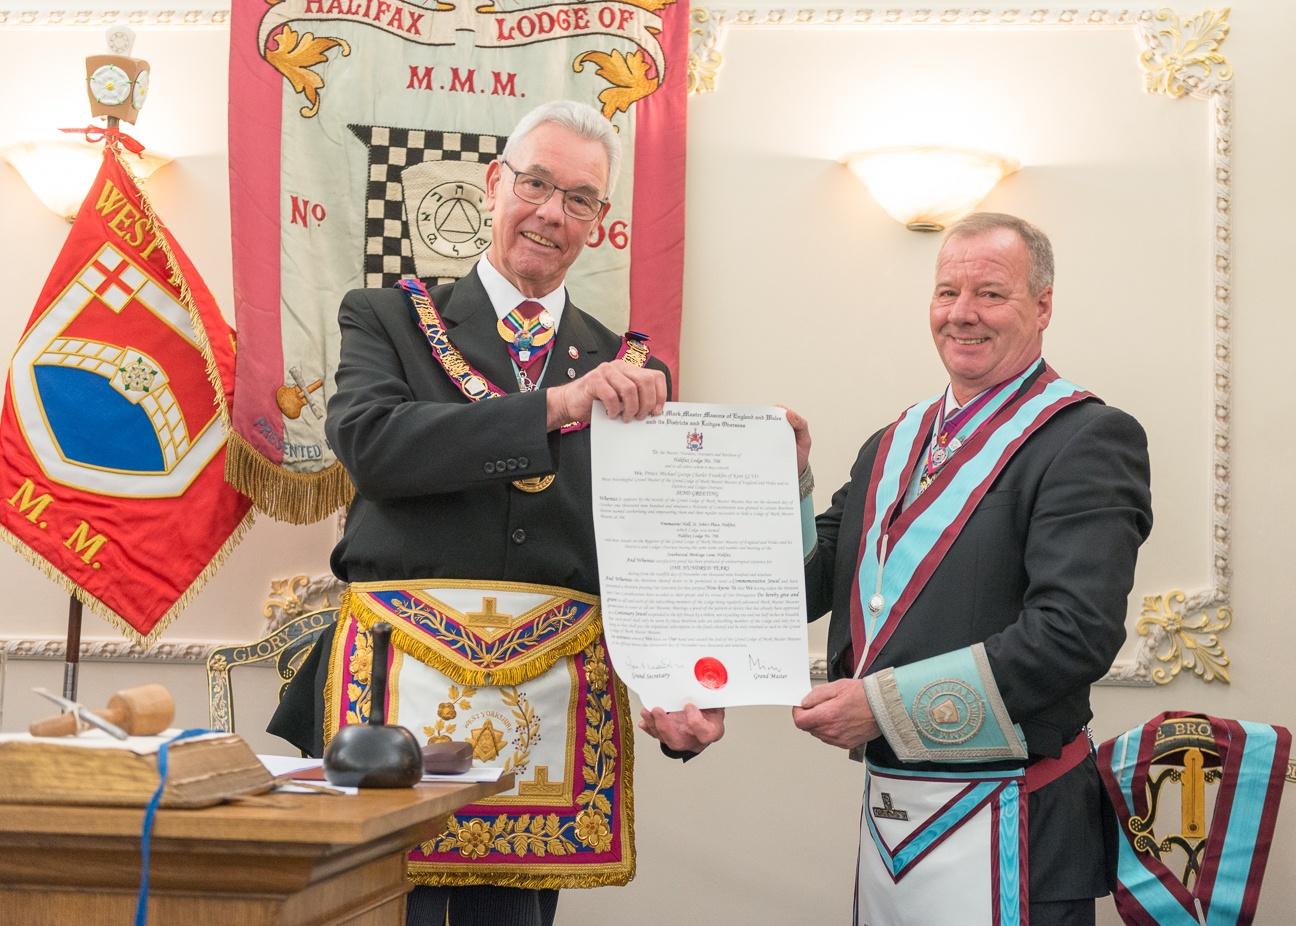 Centenary Meeting of the Halifax Lodge of Mark Master Masons No. 706.